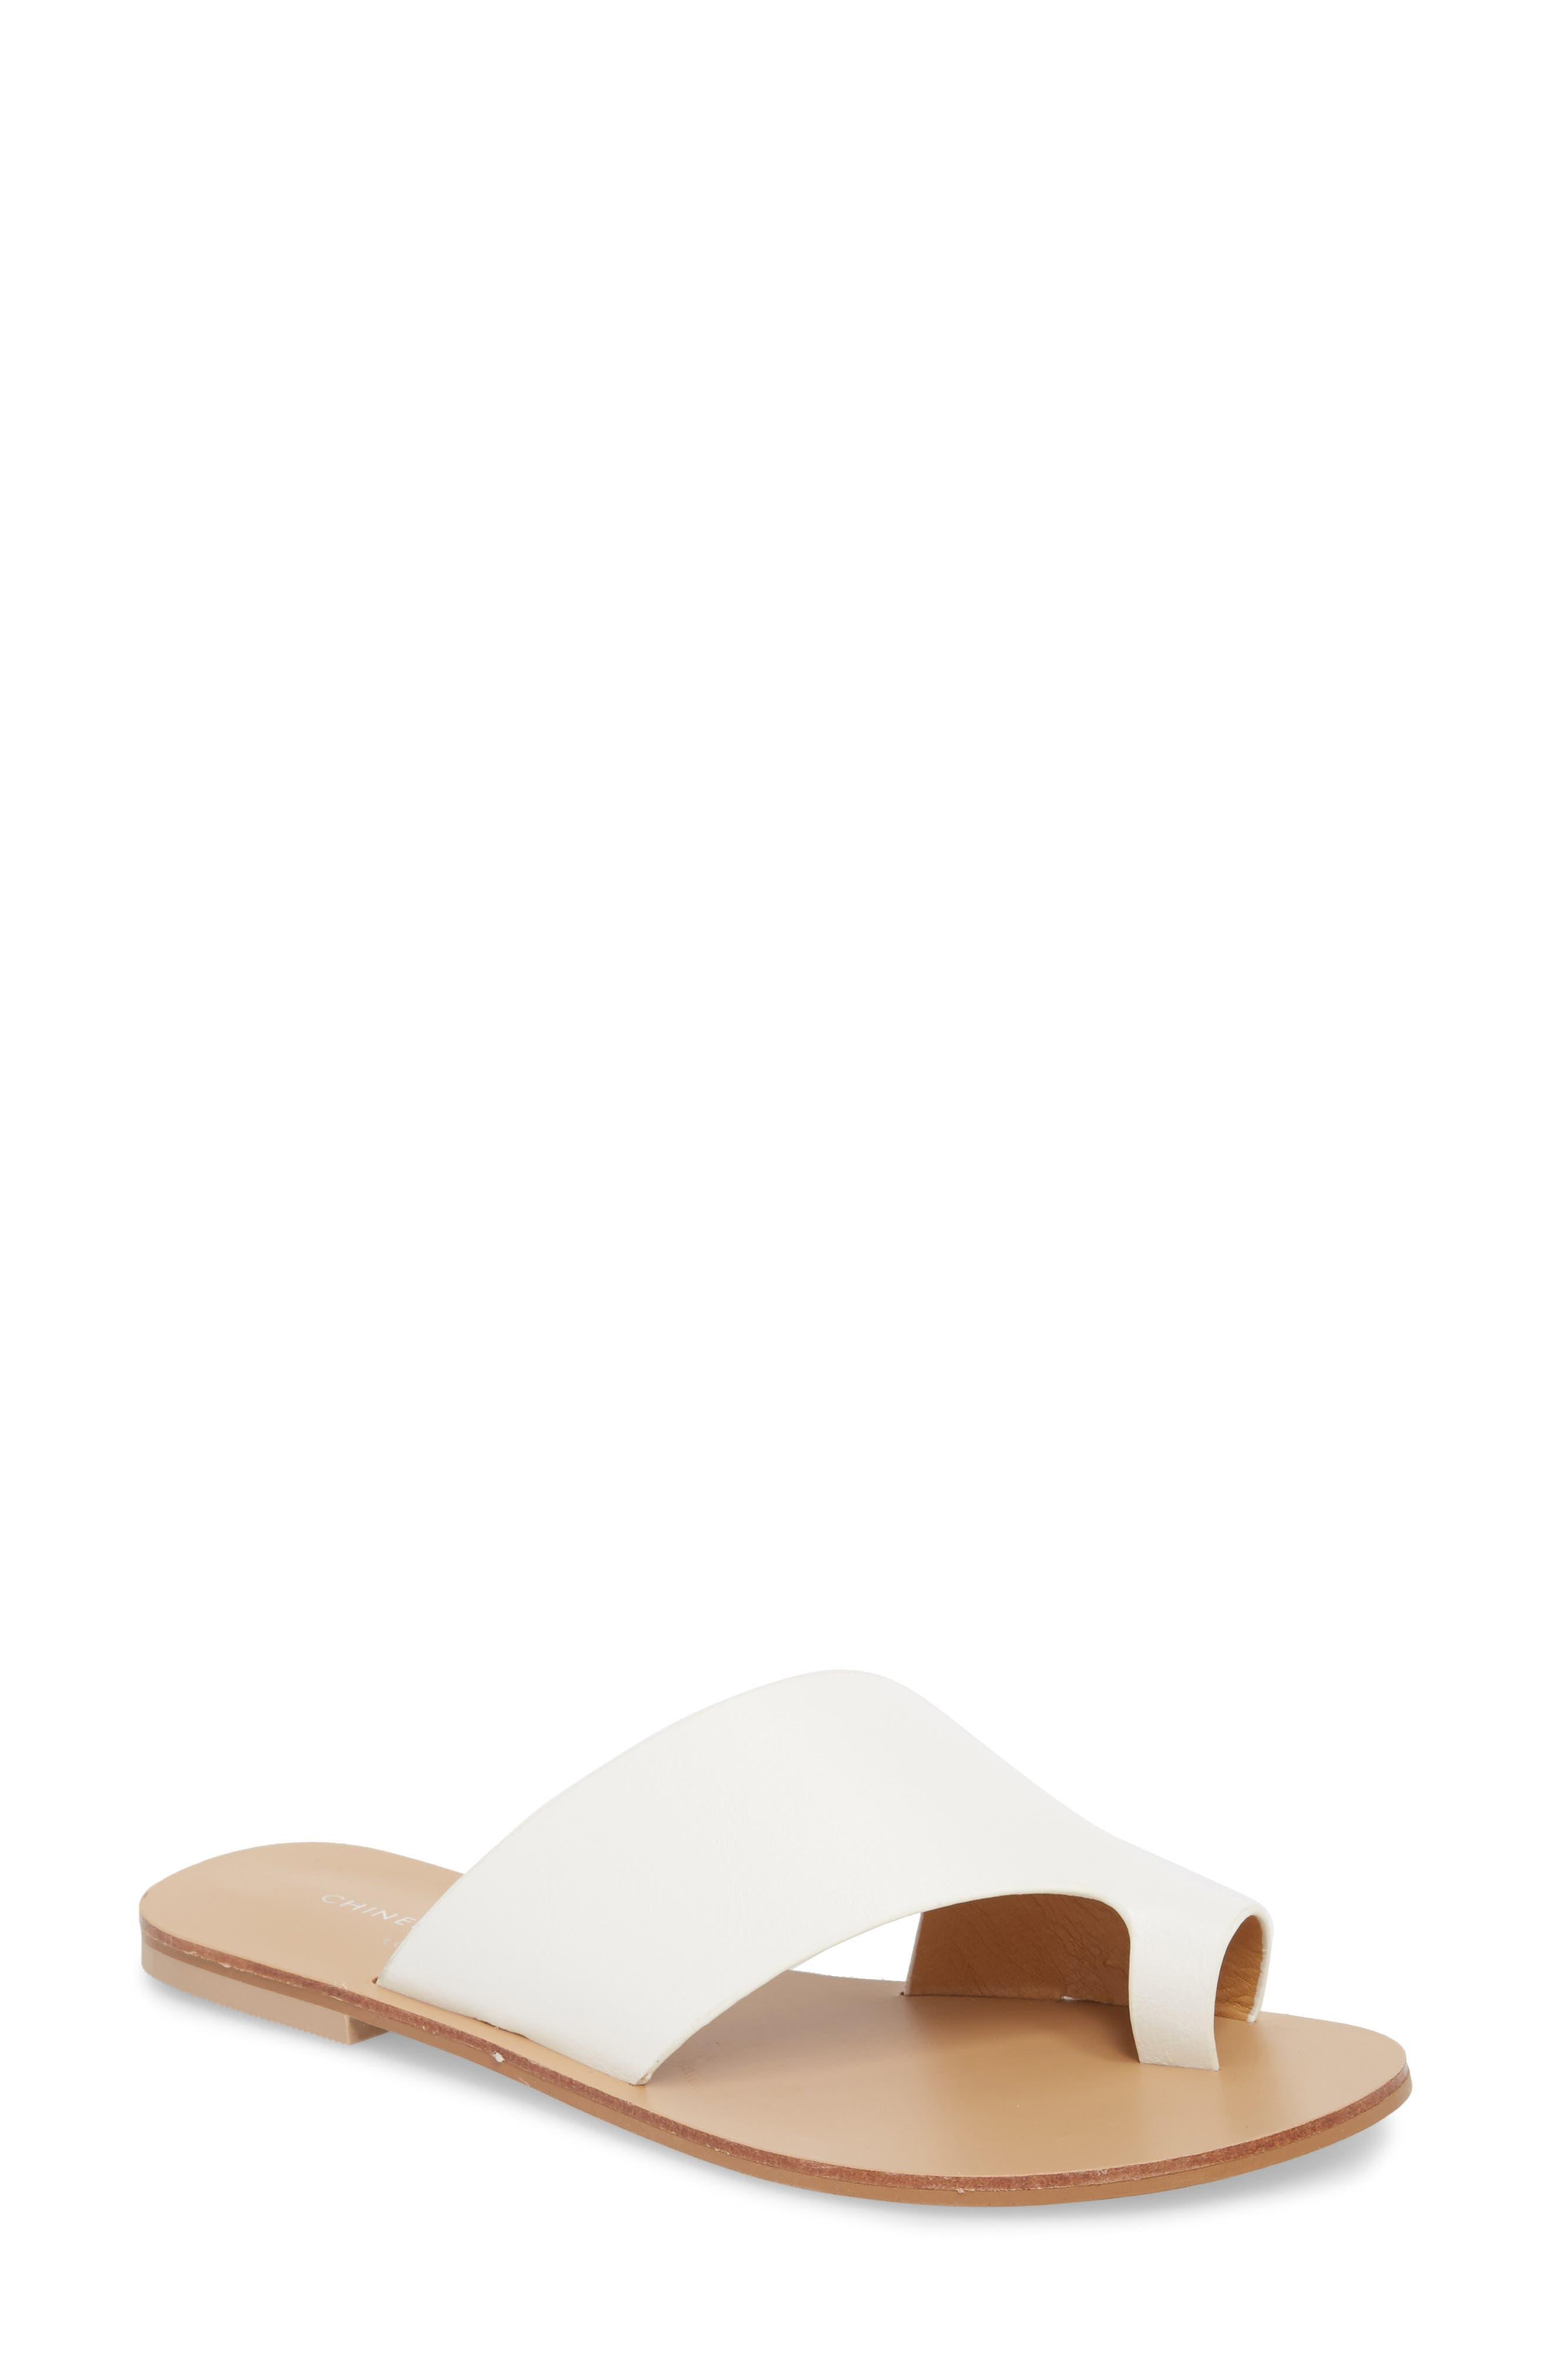 Glory Asymmetrical Slide Sandal,                             Main thumbnail 1, color,                             WHITE